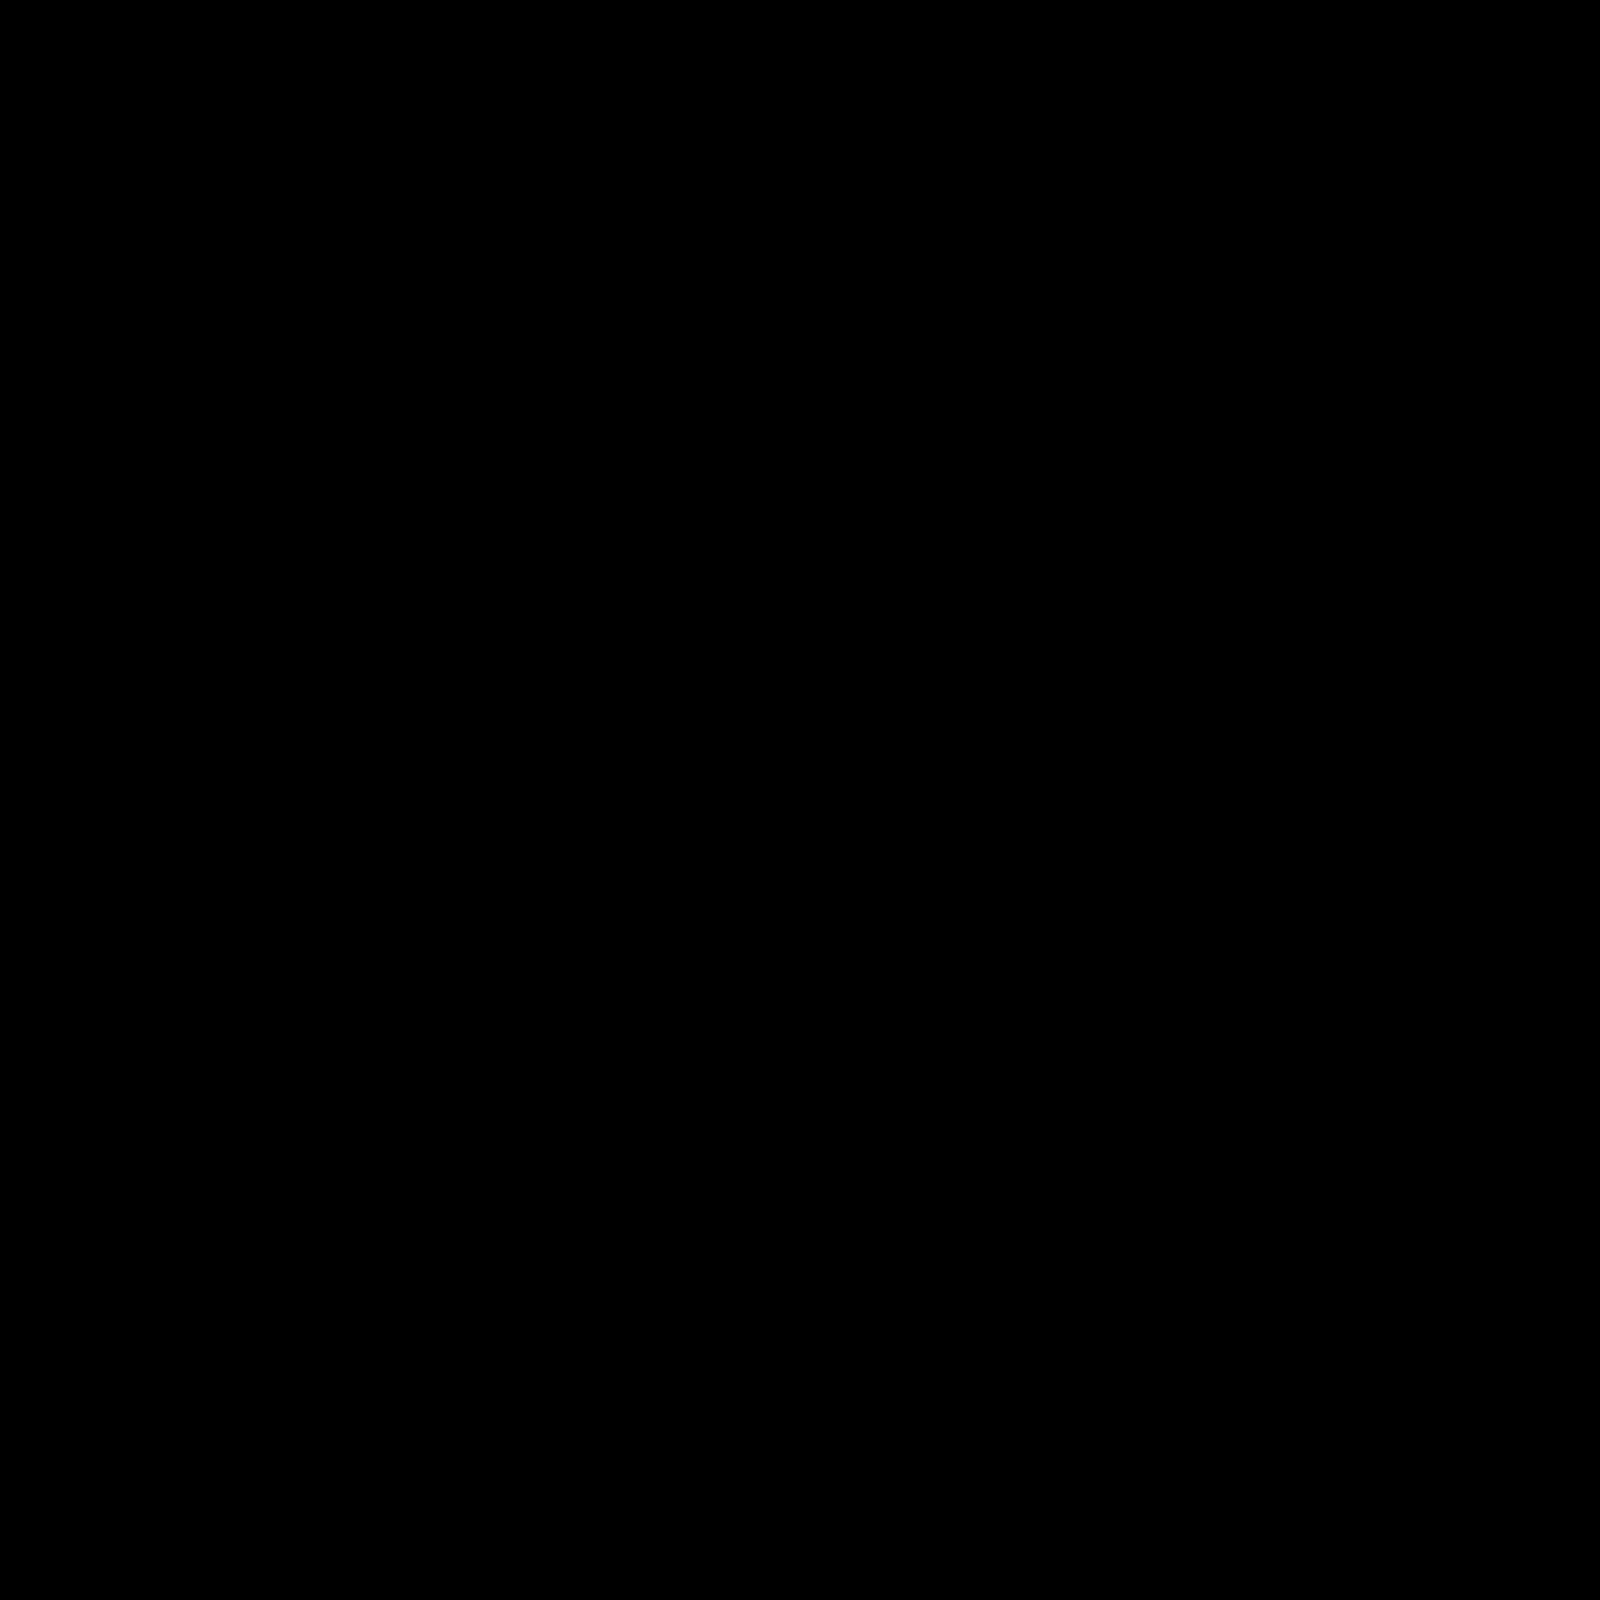 混合器 icon. This is a picture of a hand mixer from the side. You can see one of the mixing arms and it has two small sides to it. There is a small button at the very top of the mixer. You can see a handle through the side of it.